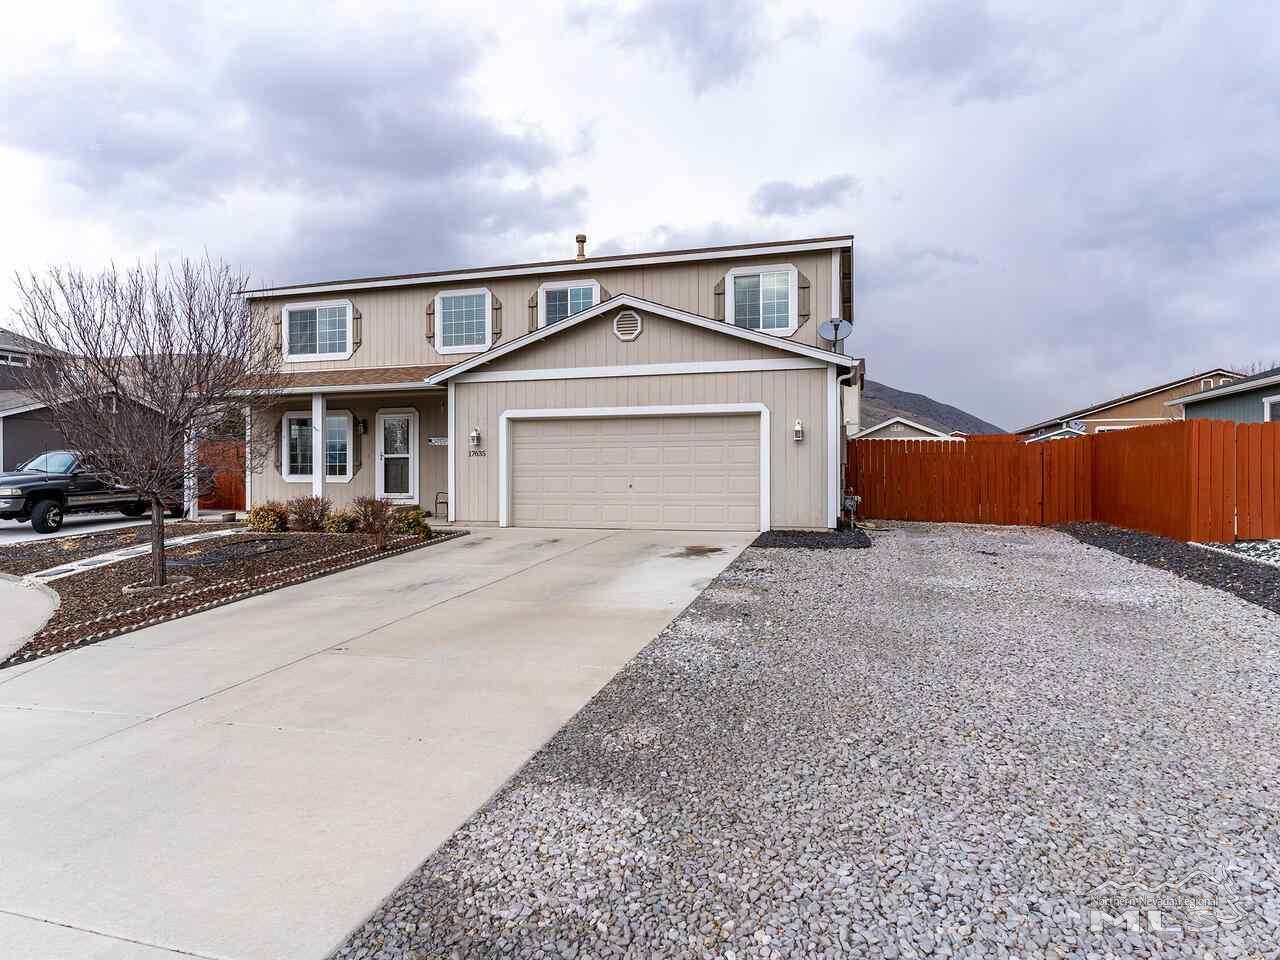 Image for 17635 Oak Brook, Reno, NV 89508